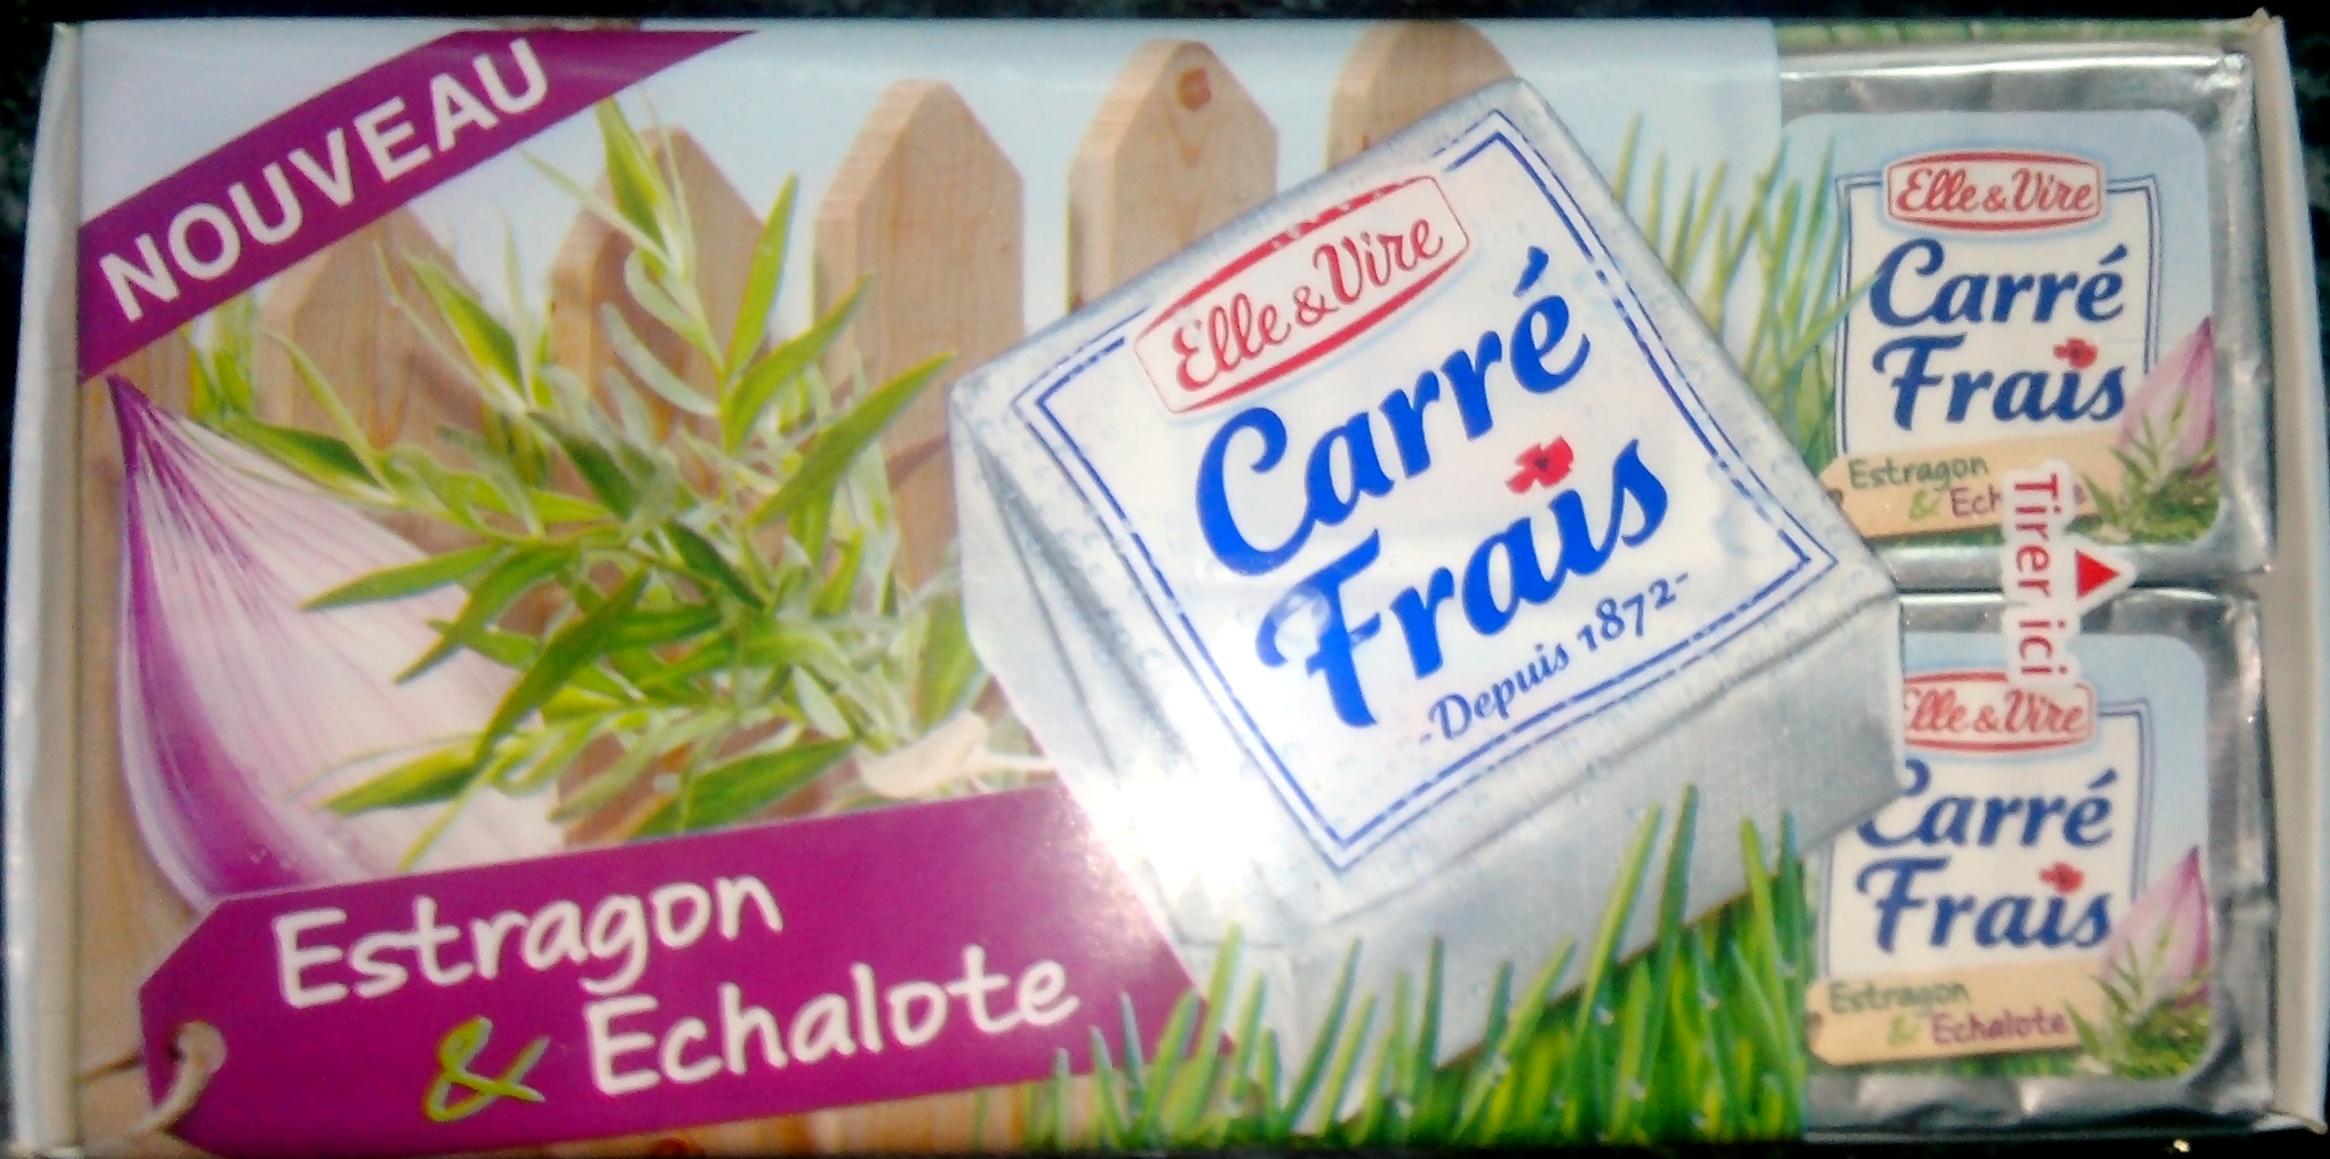 Carré Frais Estragon & Echalote (17,5% MG) - Produit - fr